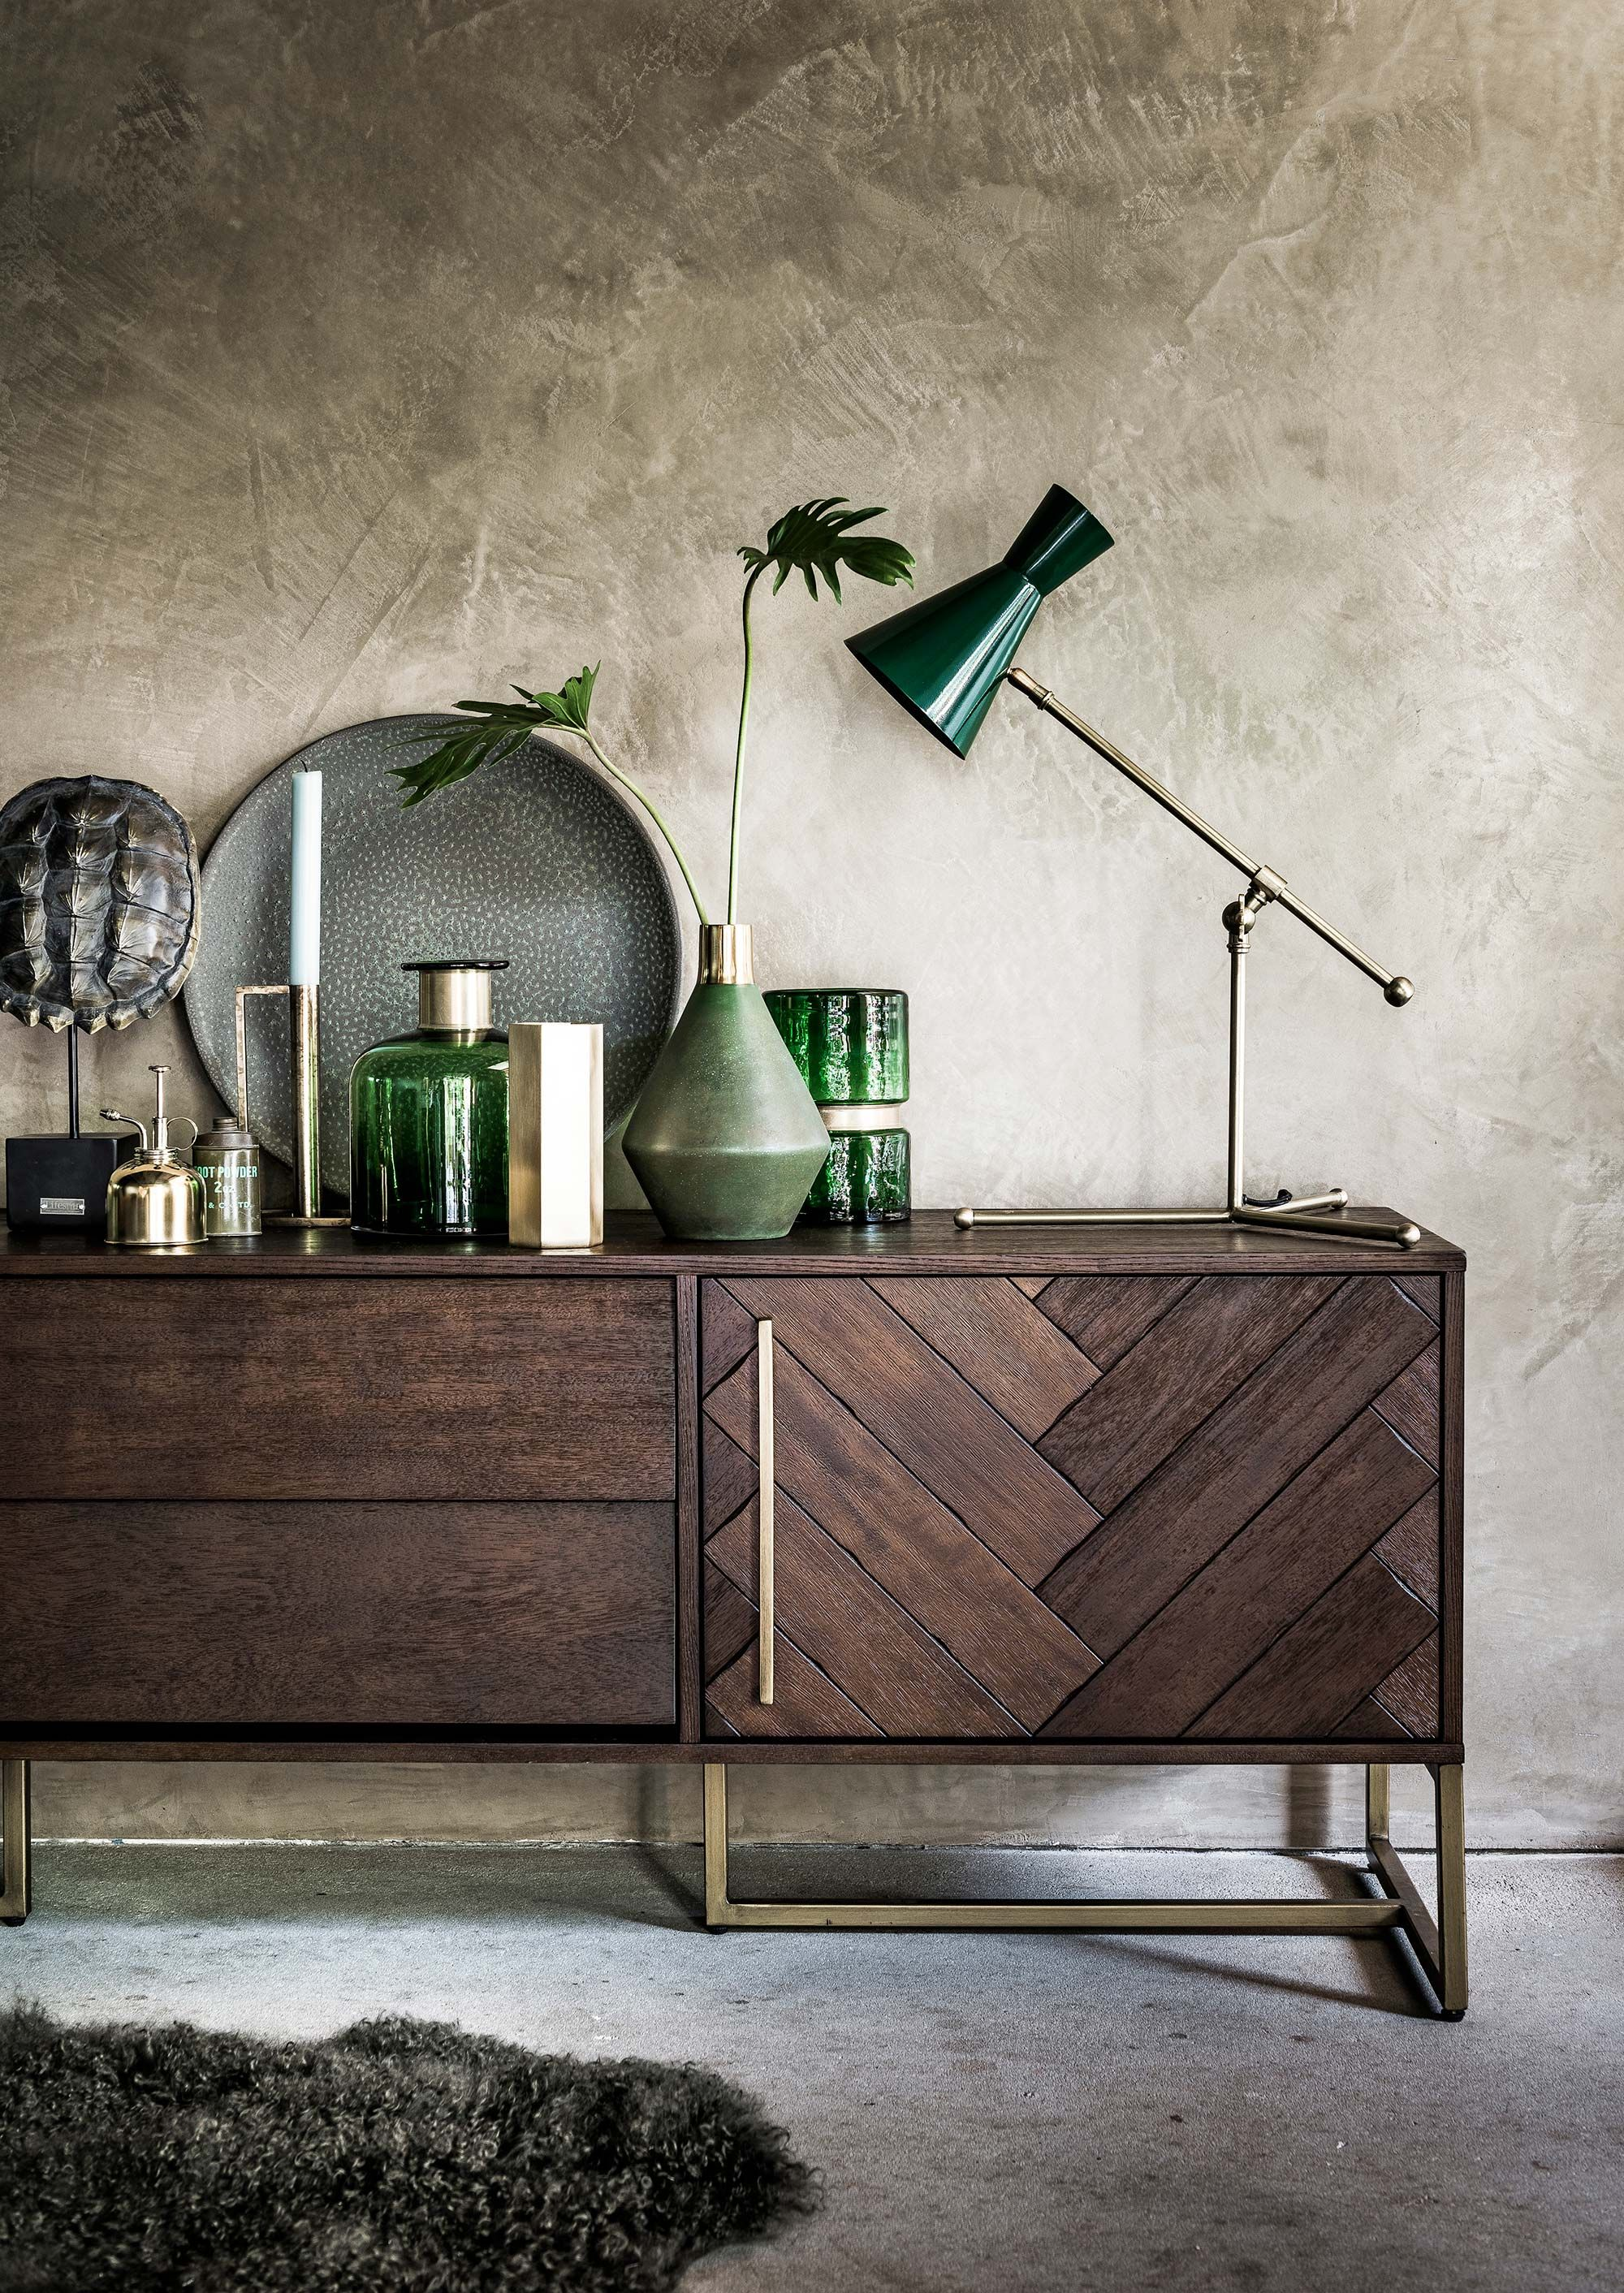 modern living room with emerald decor einrichtung inspiraiton pinterest dunkles holz. Black Bedroom Furniture Sets. Home Design Ideas